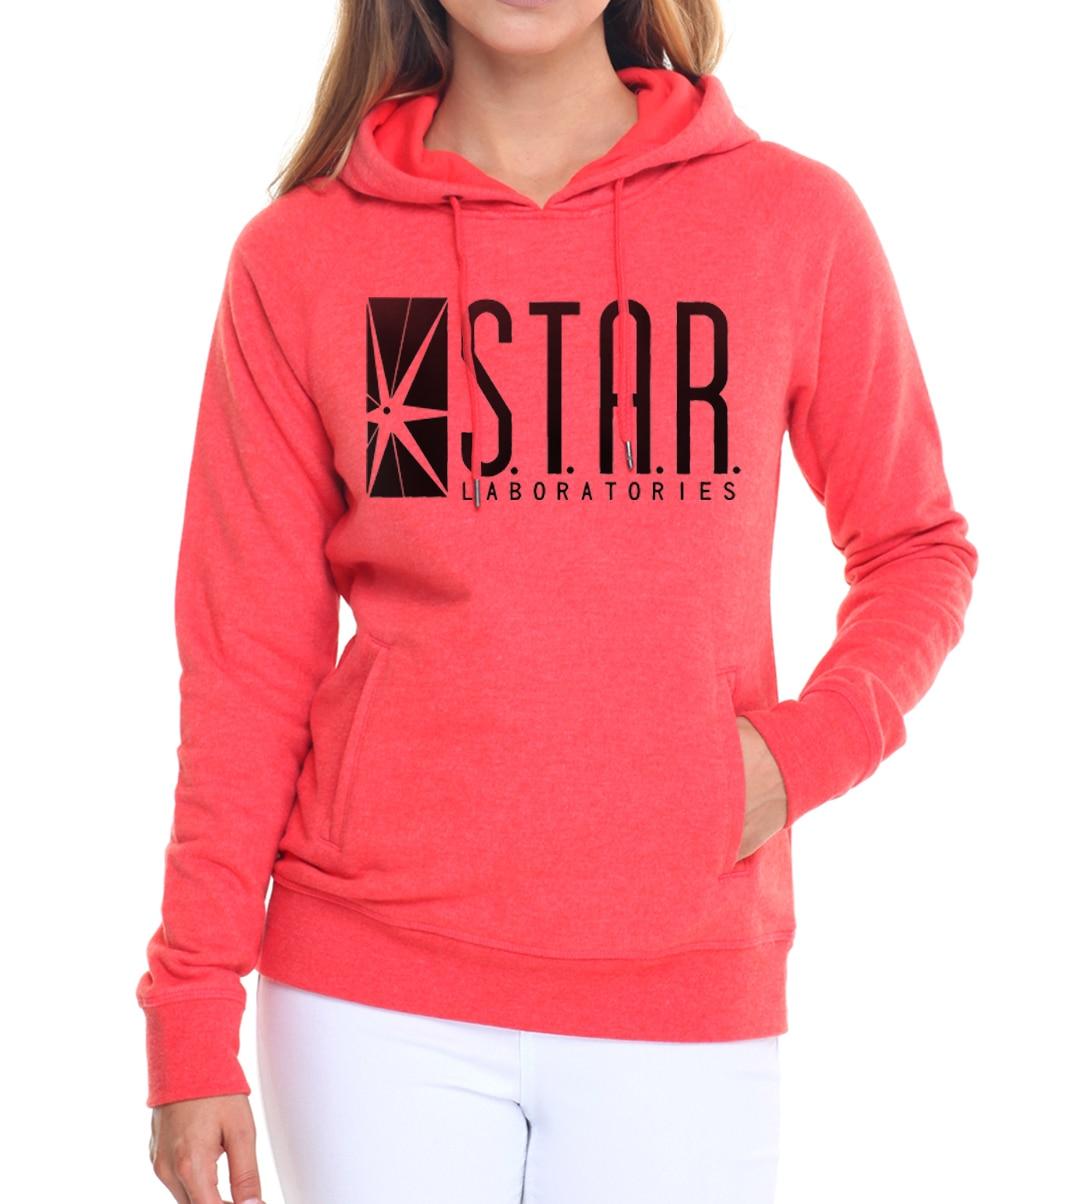 hip hop hoodies femme funny brand tracksuits  casual kpop printed top pullovers 2019 autumn women long sleeve sweatshirt